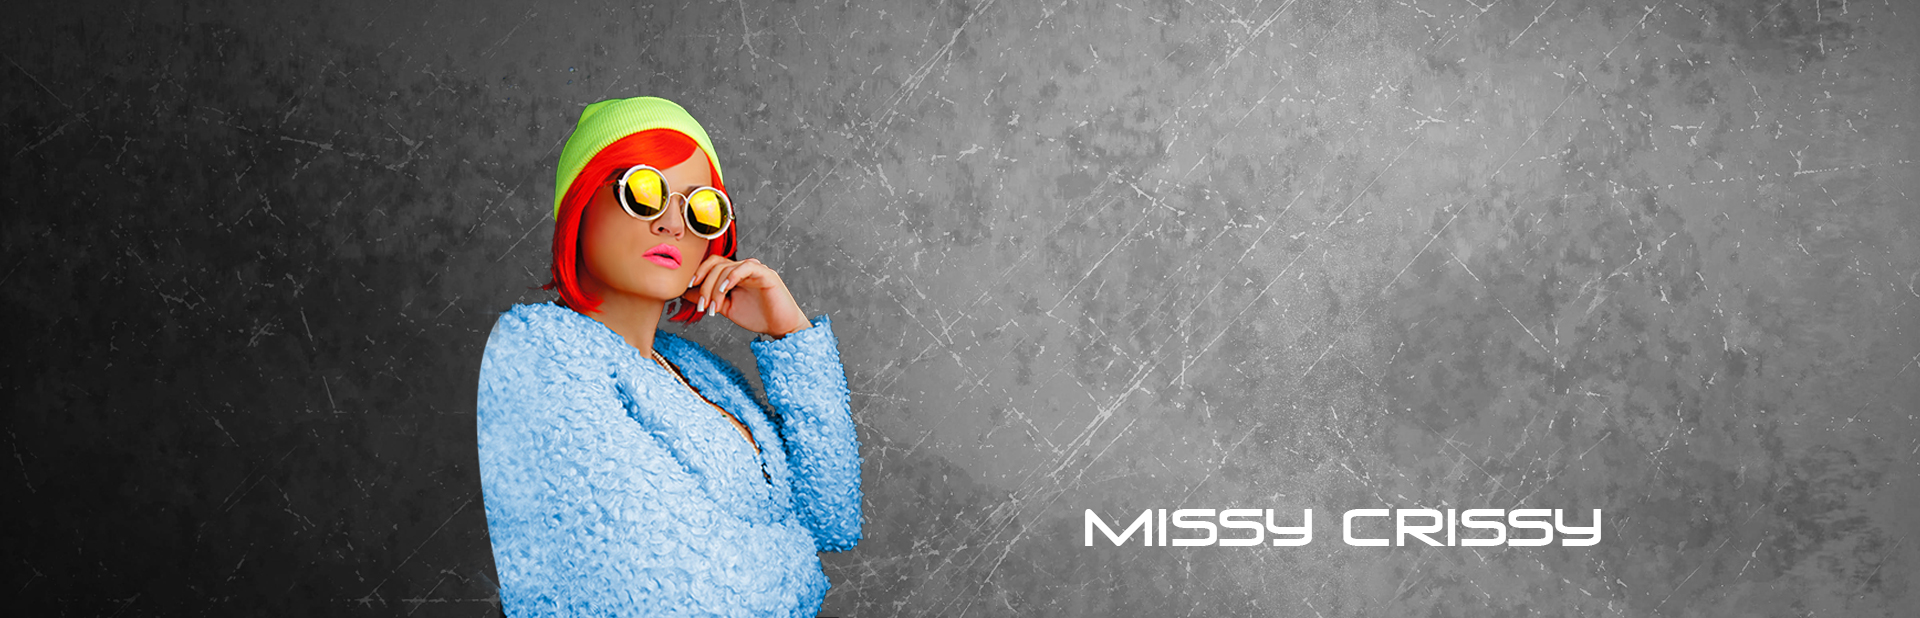 Missy Crissy